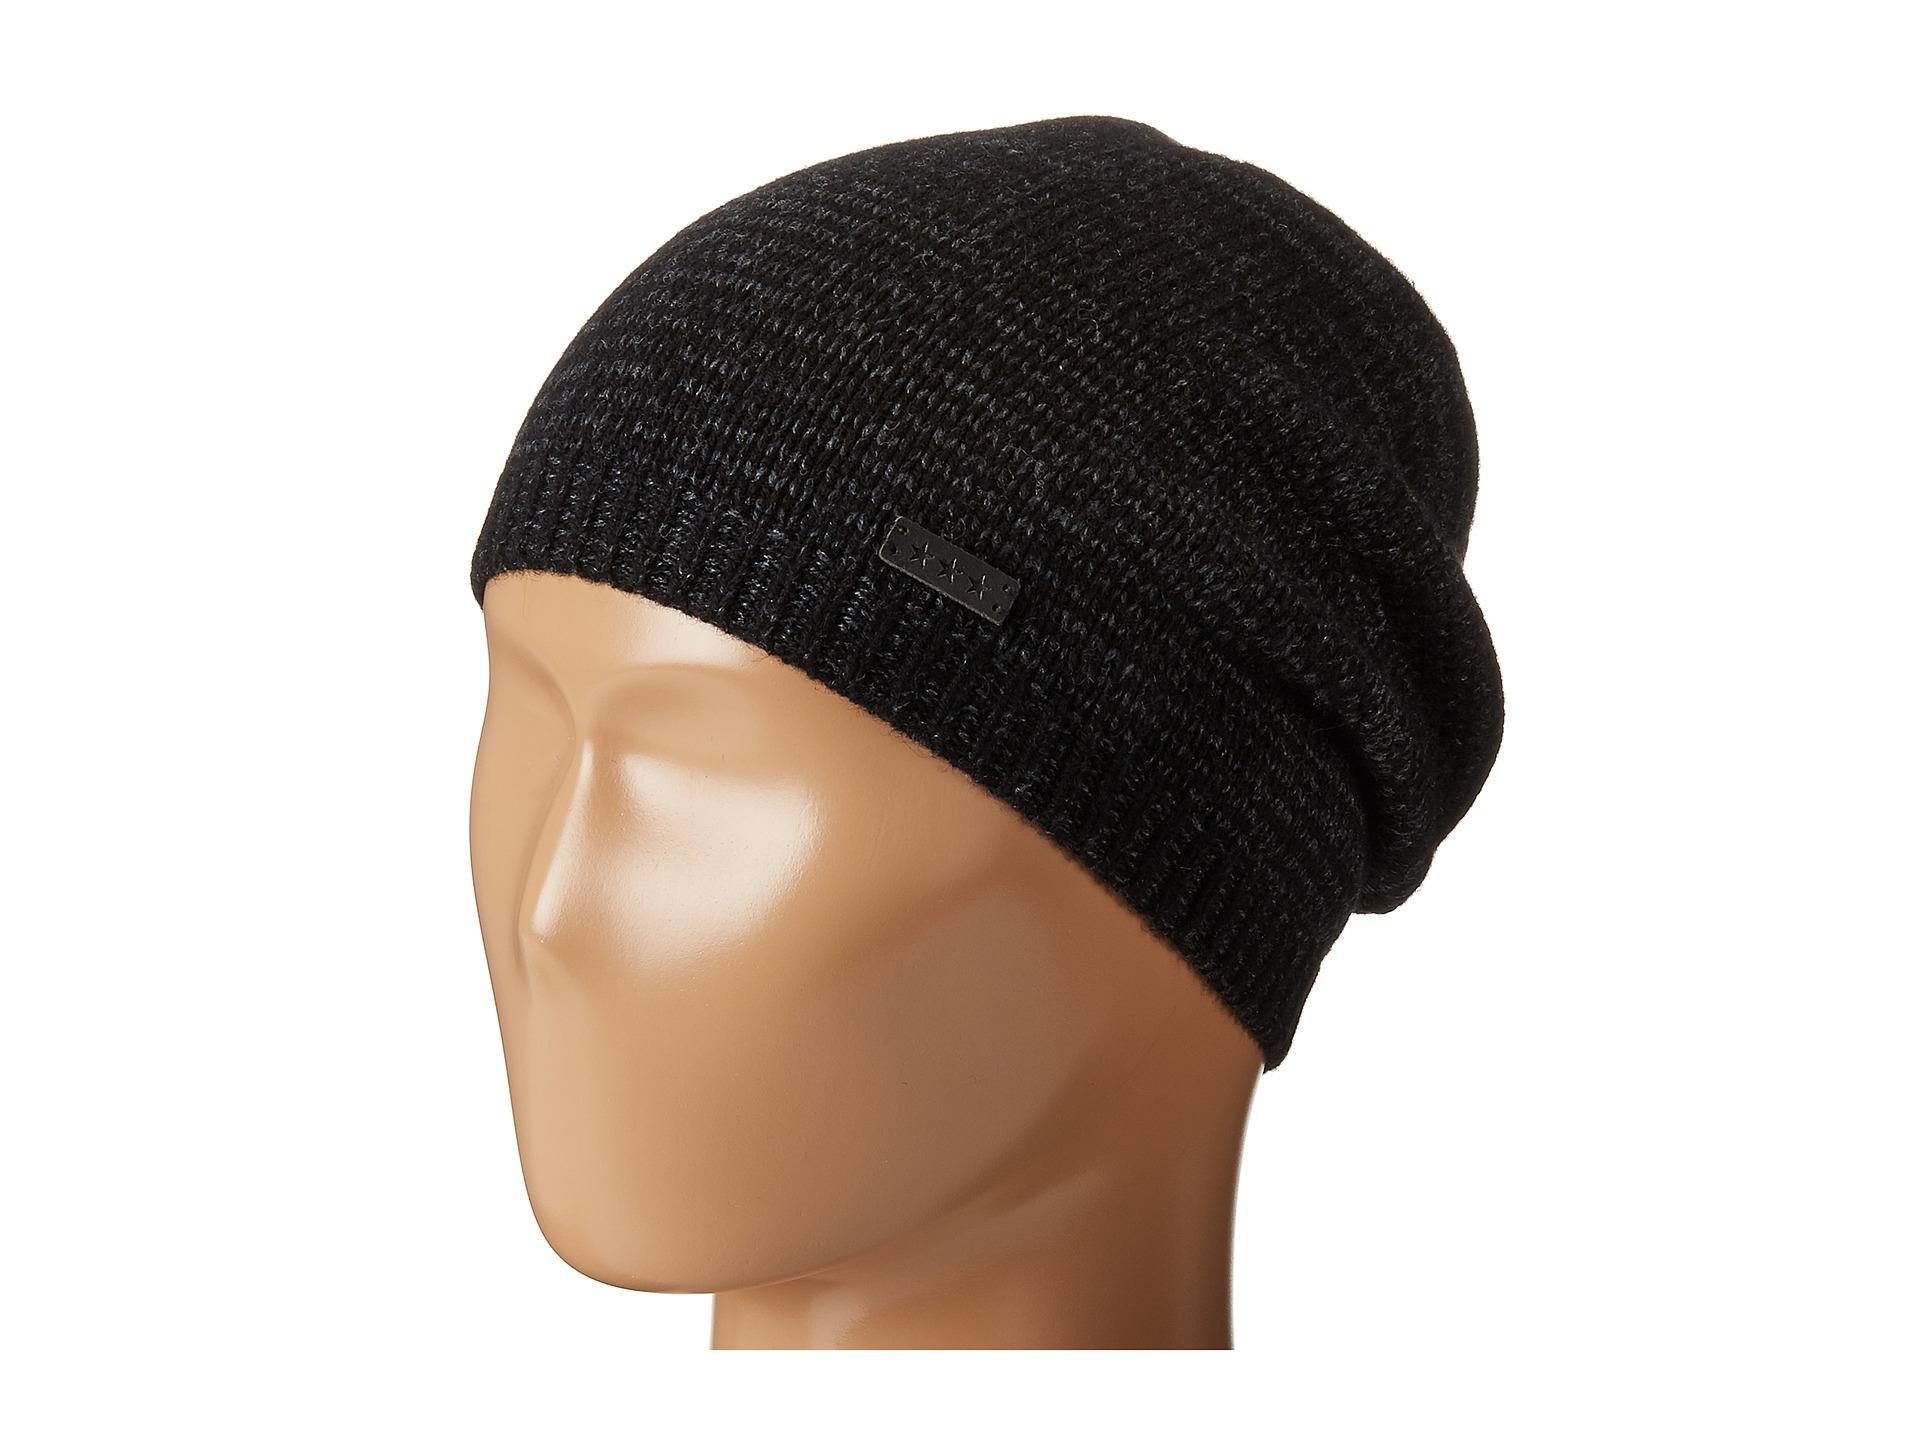 Lyst - John Varvatos Ombre Random Feed Knit Hat in Black for Men 3da883801a2